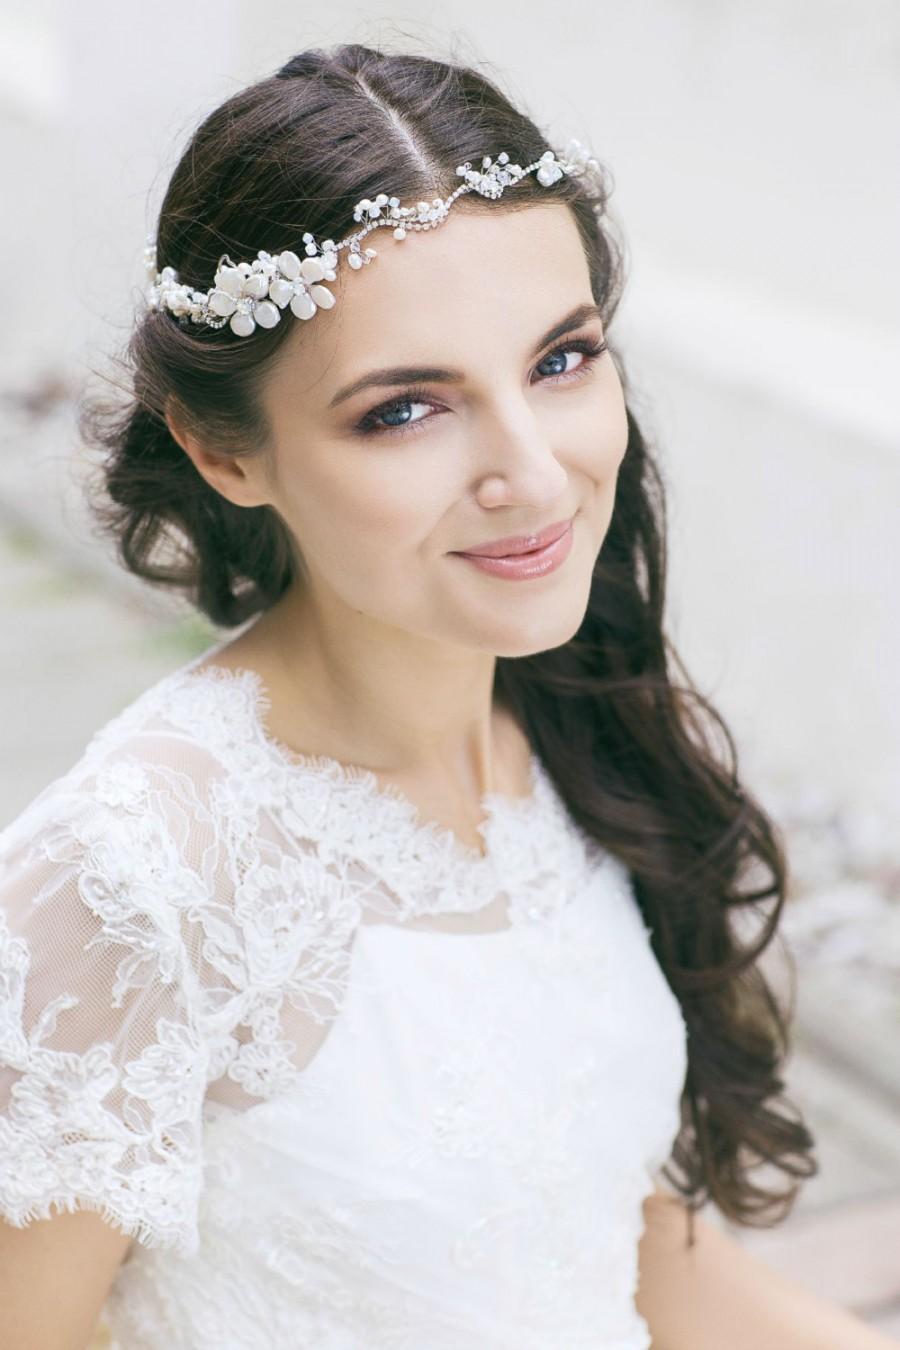 Wedding Headpiece  Bridal Hair Piece  Wedding Floral Hair Accessories  Bridal Halo Circlet ...